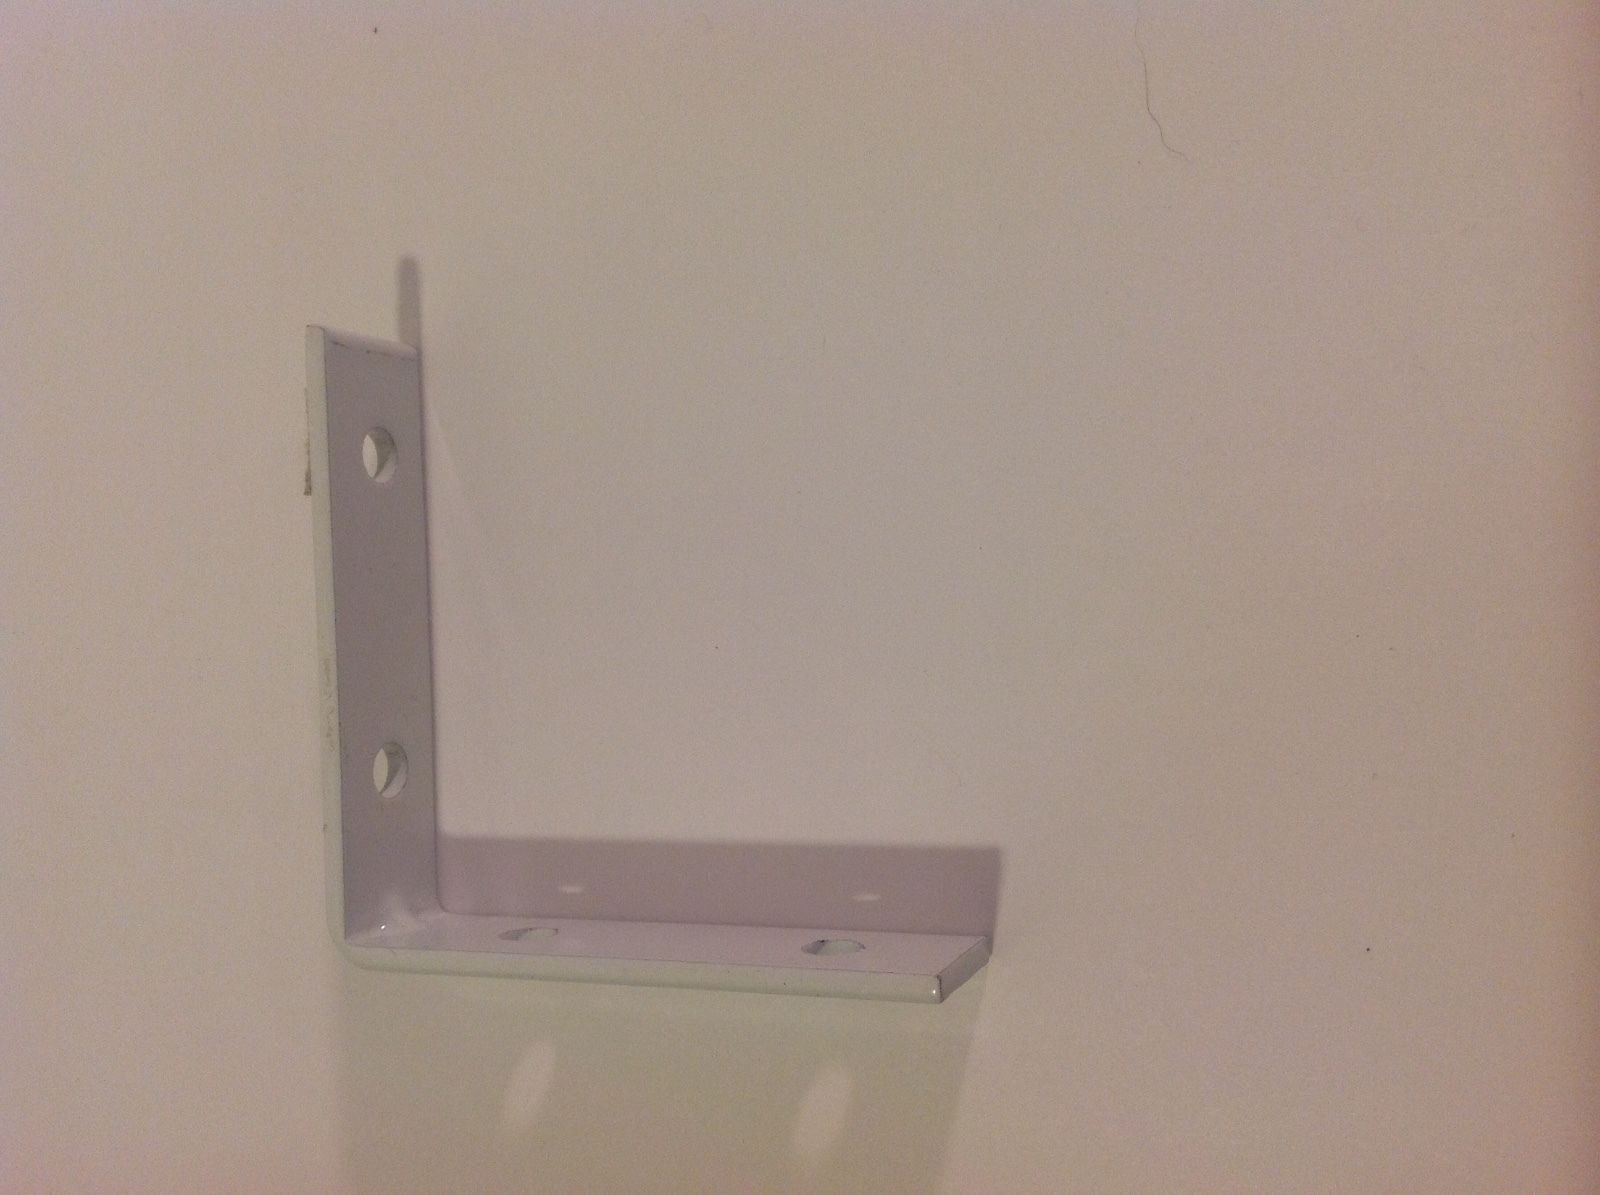 ALF_CAD 3 x 3 Angle Iron white L Bracket Corner Brace Metal Install Shelf Cabinet